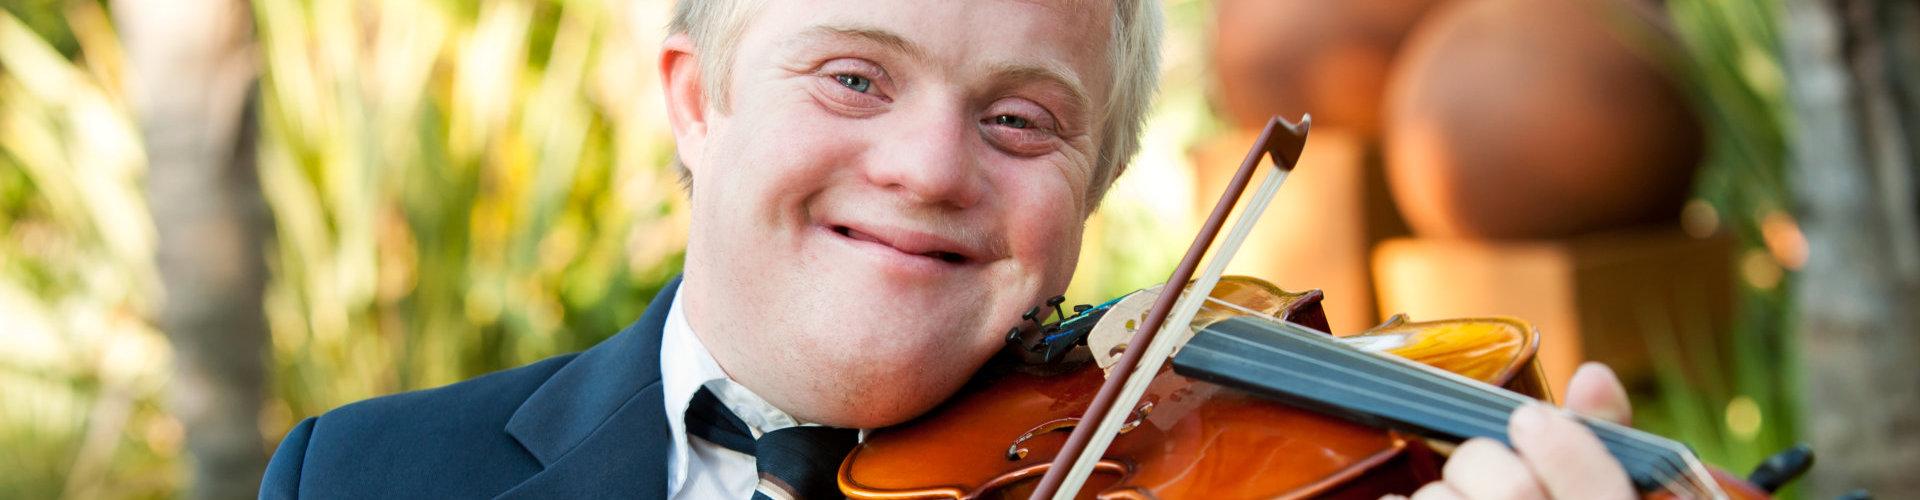 happy kid playing violin